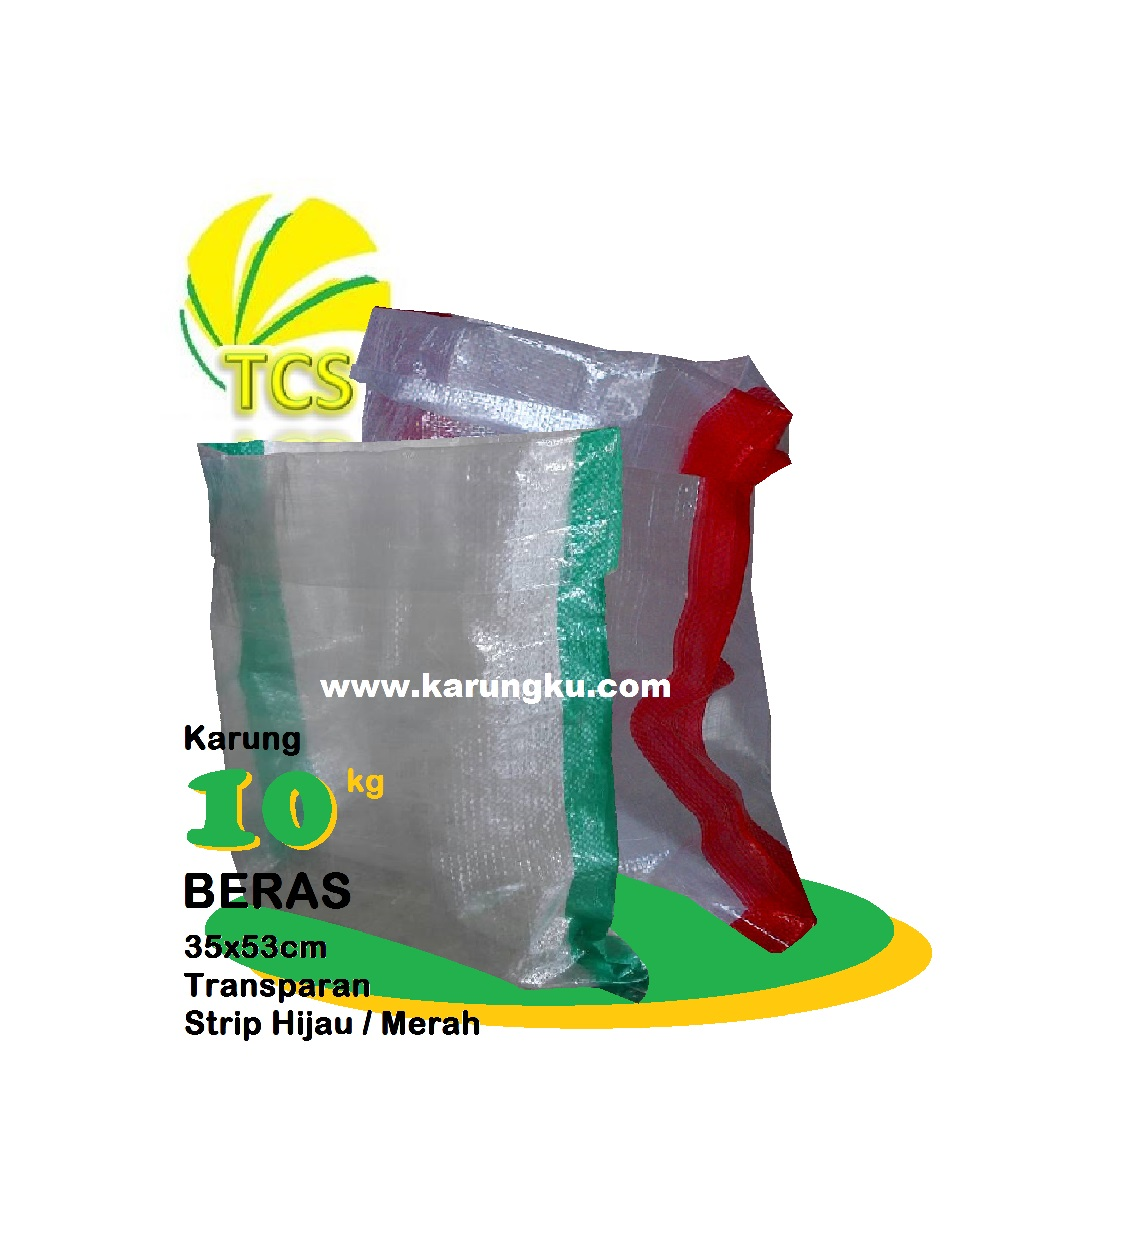 You are currently viewing Karung Plastik Transparan 10kg (35x53cm)